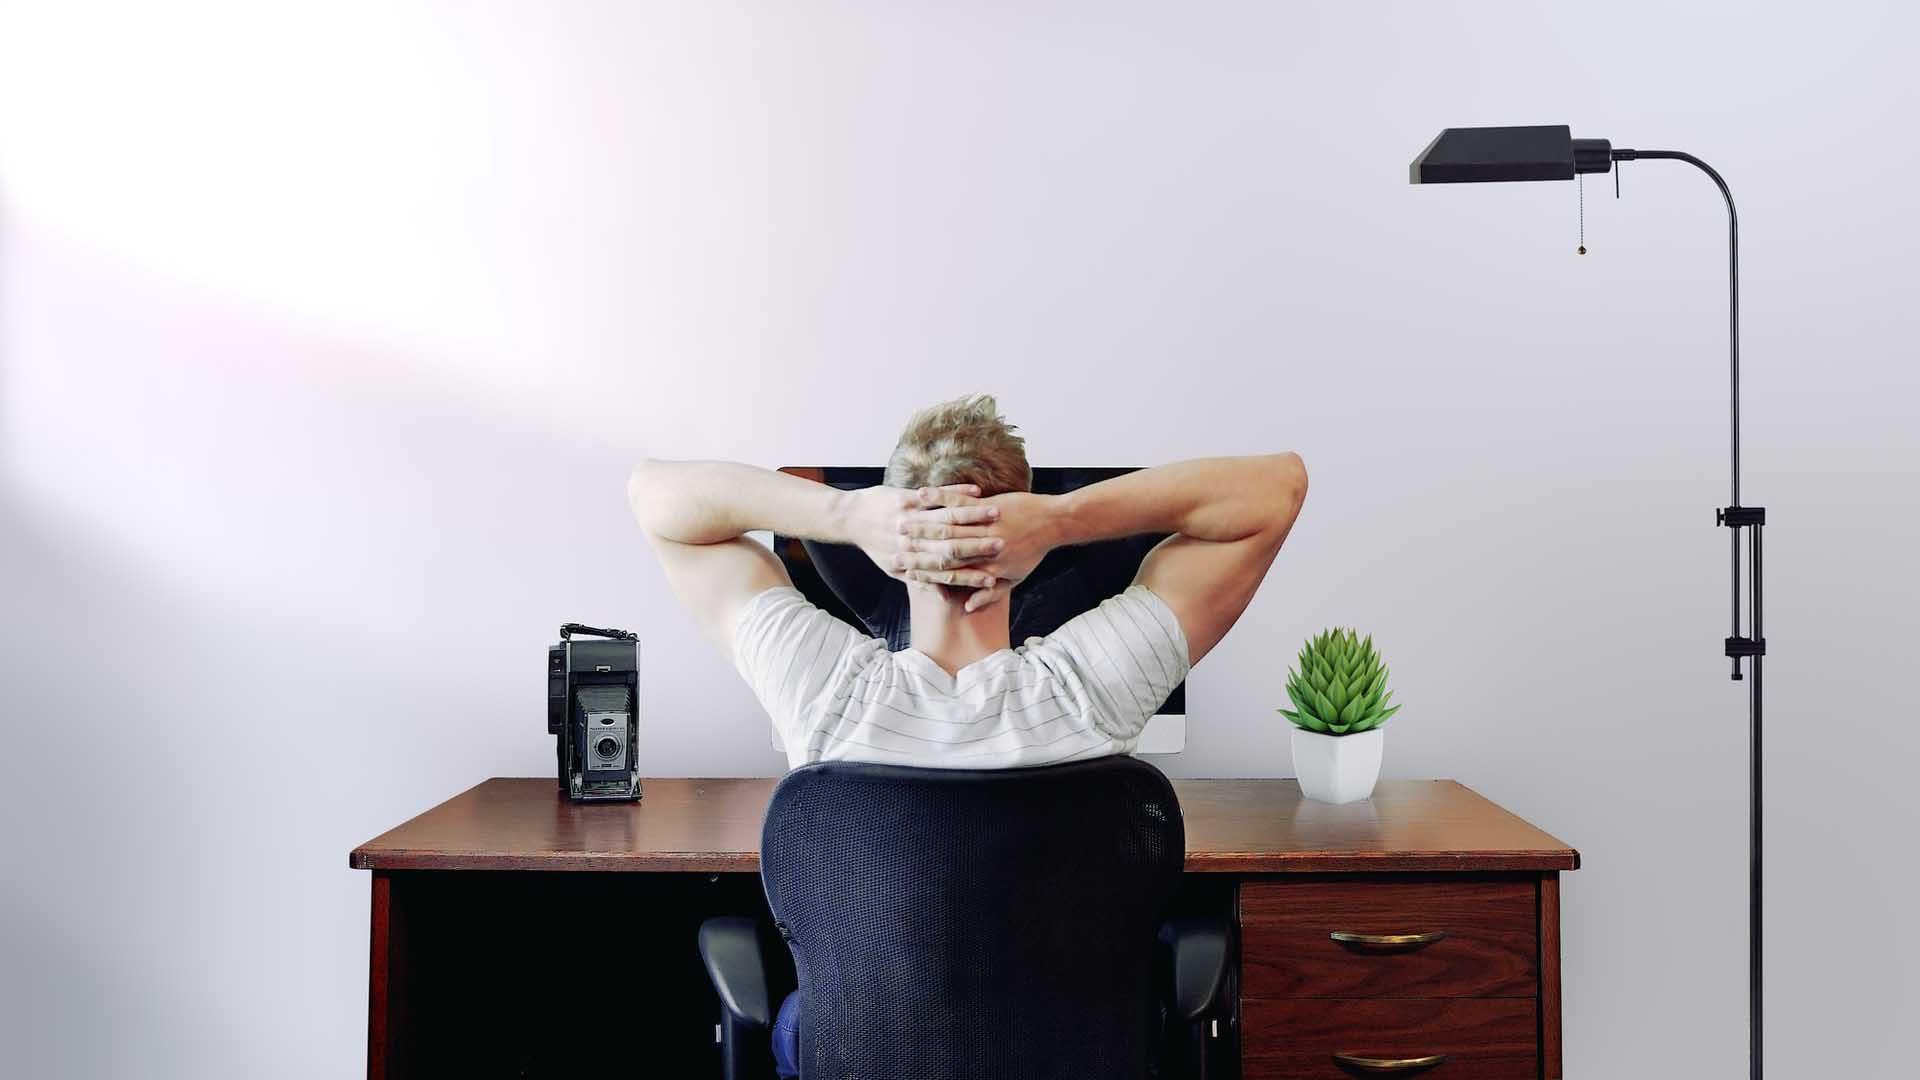 Idea development - man sitting at desk with hands behind head (thinking)